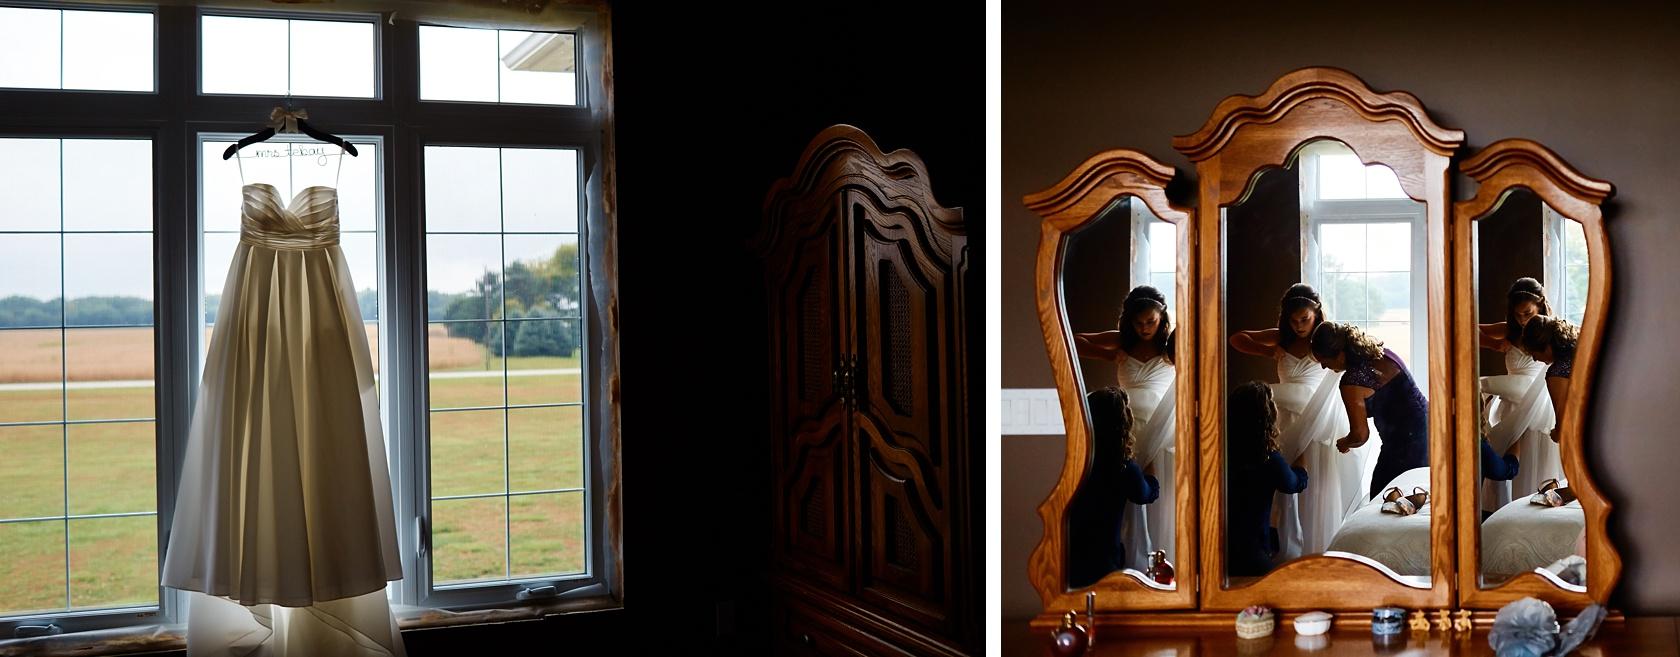 000006-farm-wedding-stephen-sager-photography